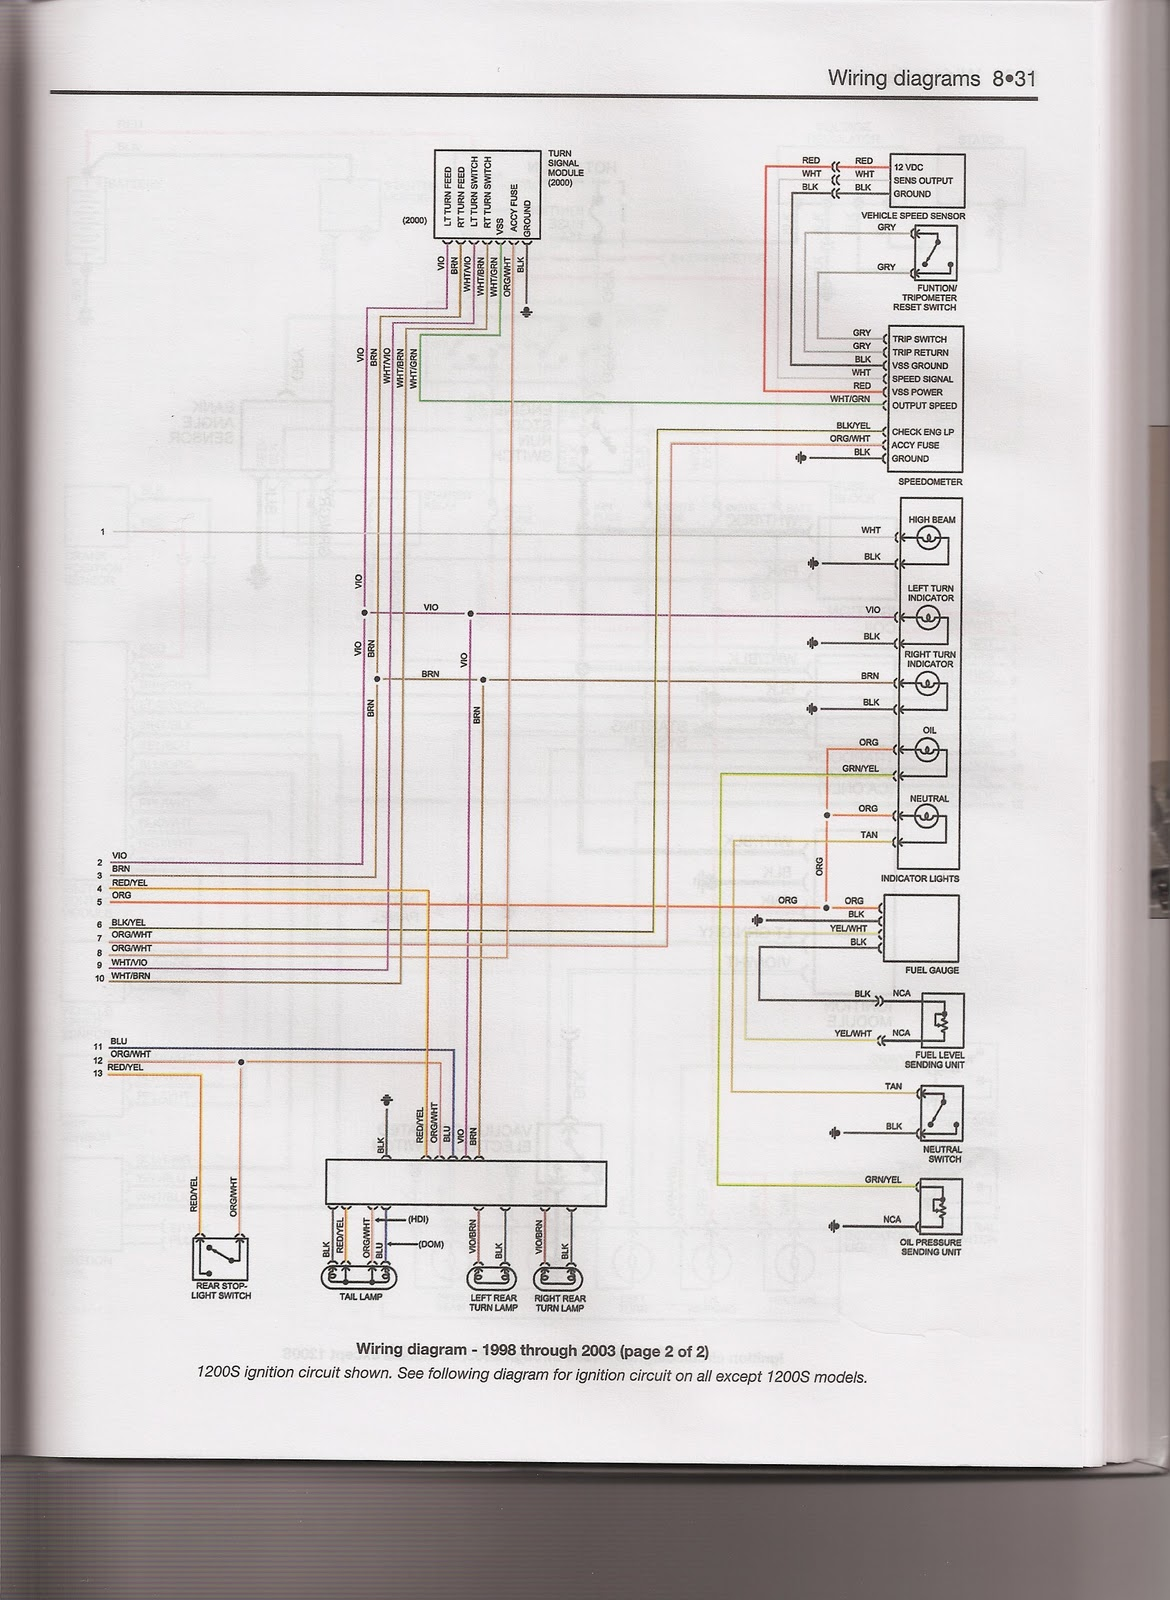 phone jack wiring diagram 2010 [ 1170 x 1600 Pixel ]